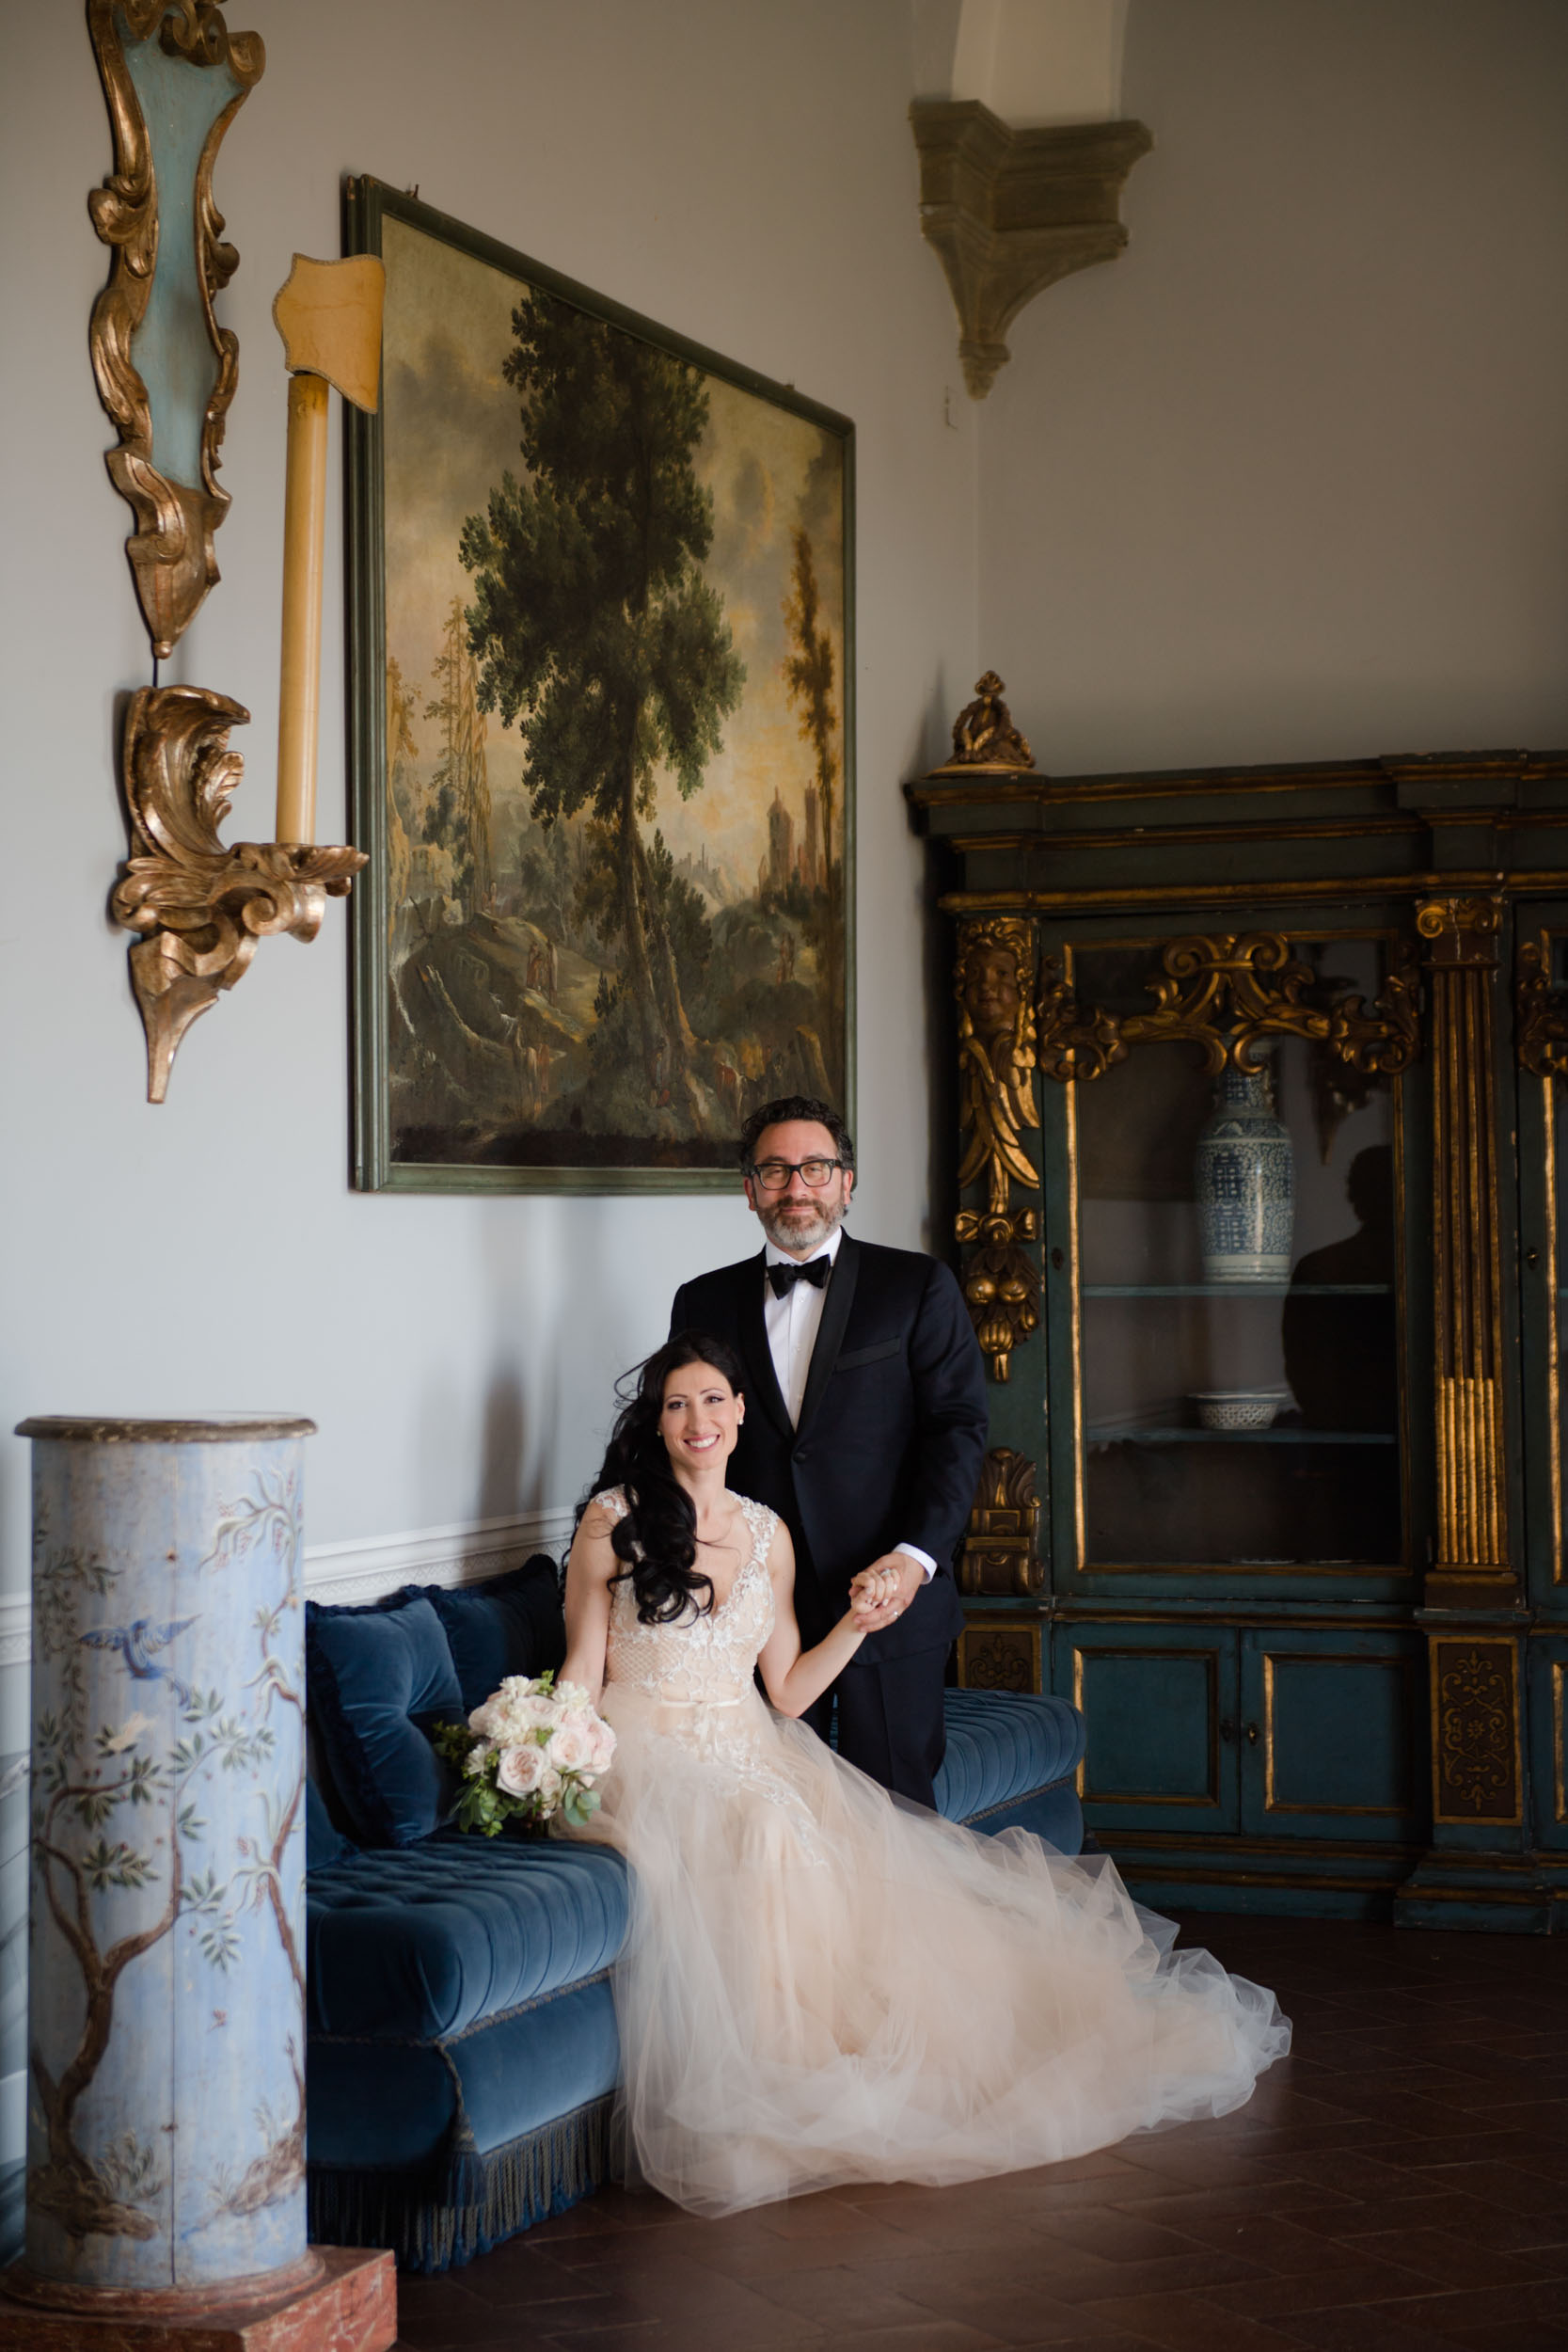 villa-gamberaia-florence-italy-destination-wedding-27.jpg